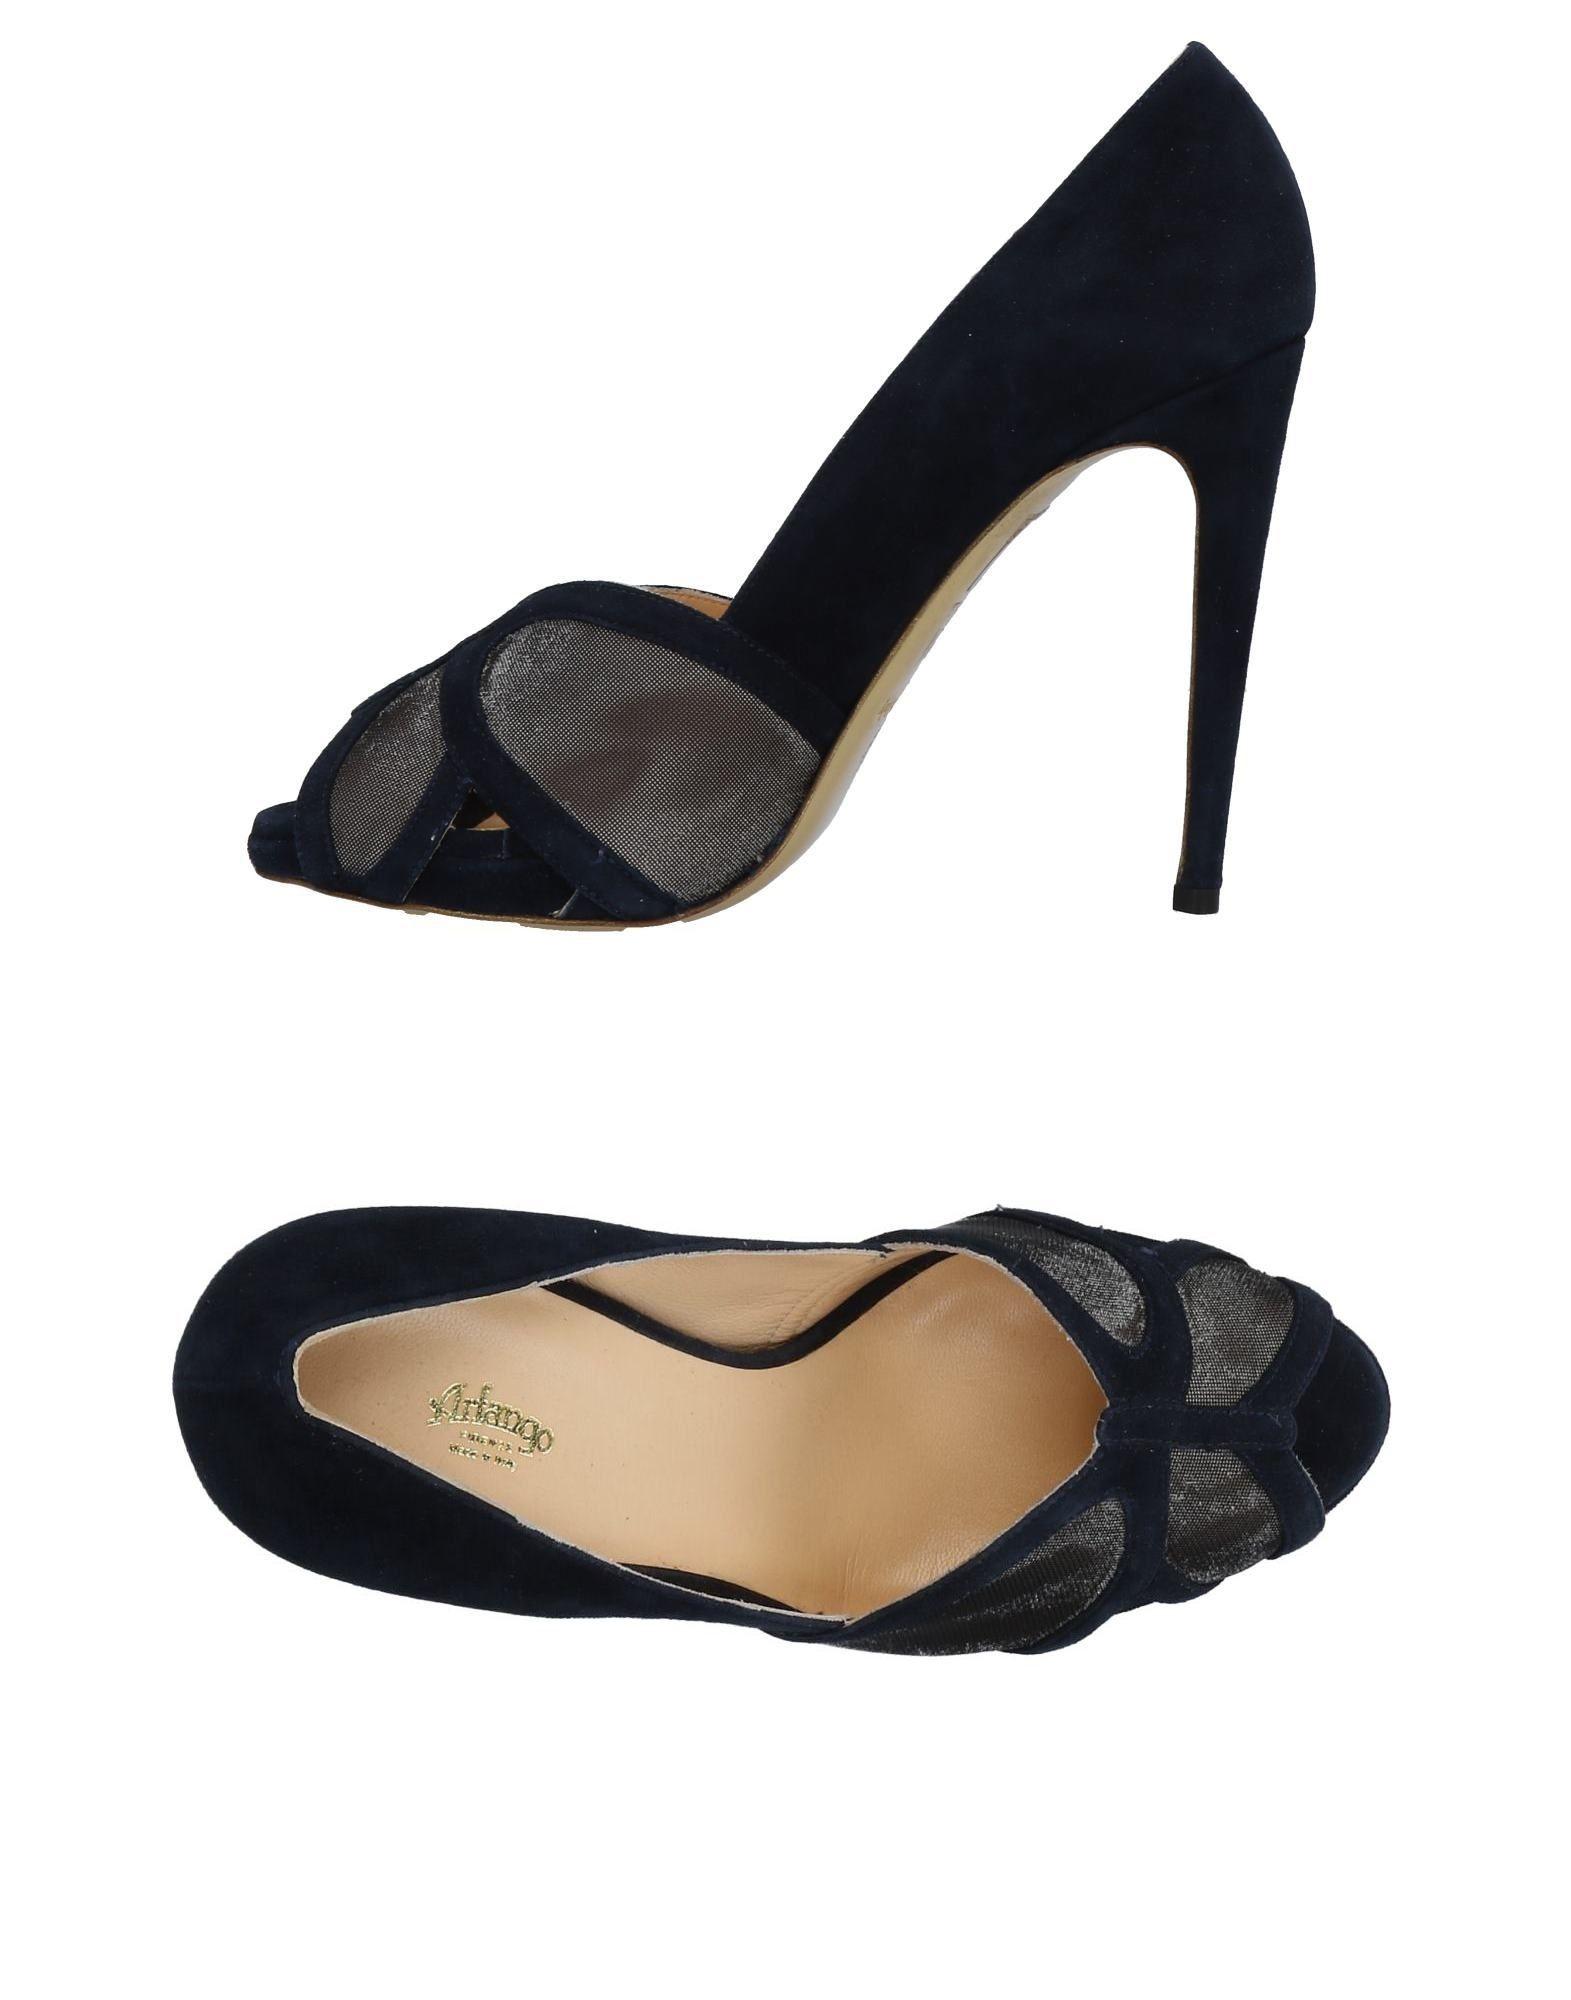 Haltbare Mode billige Schuhe Arfango Pumps Damen  11475009AL Heiße Schuhe